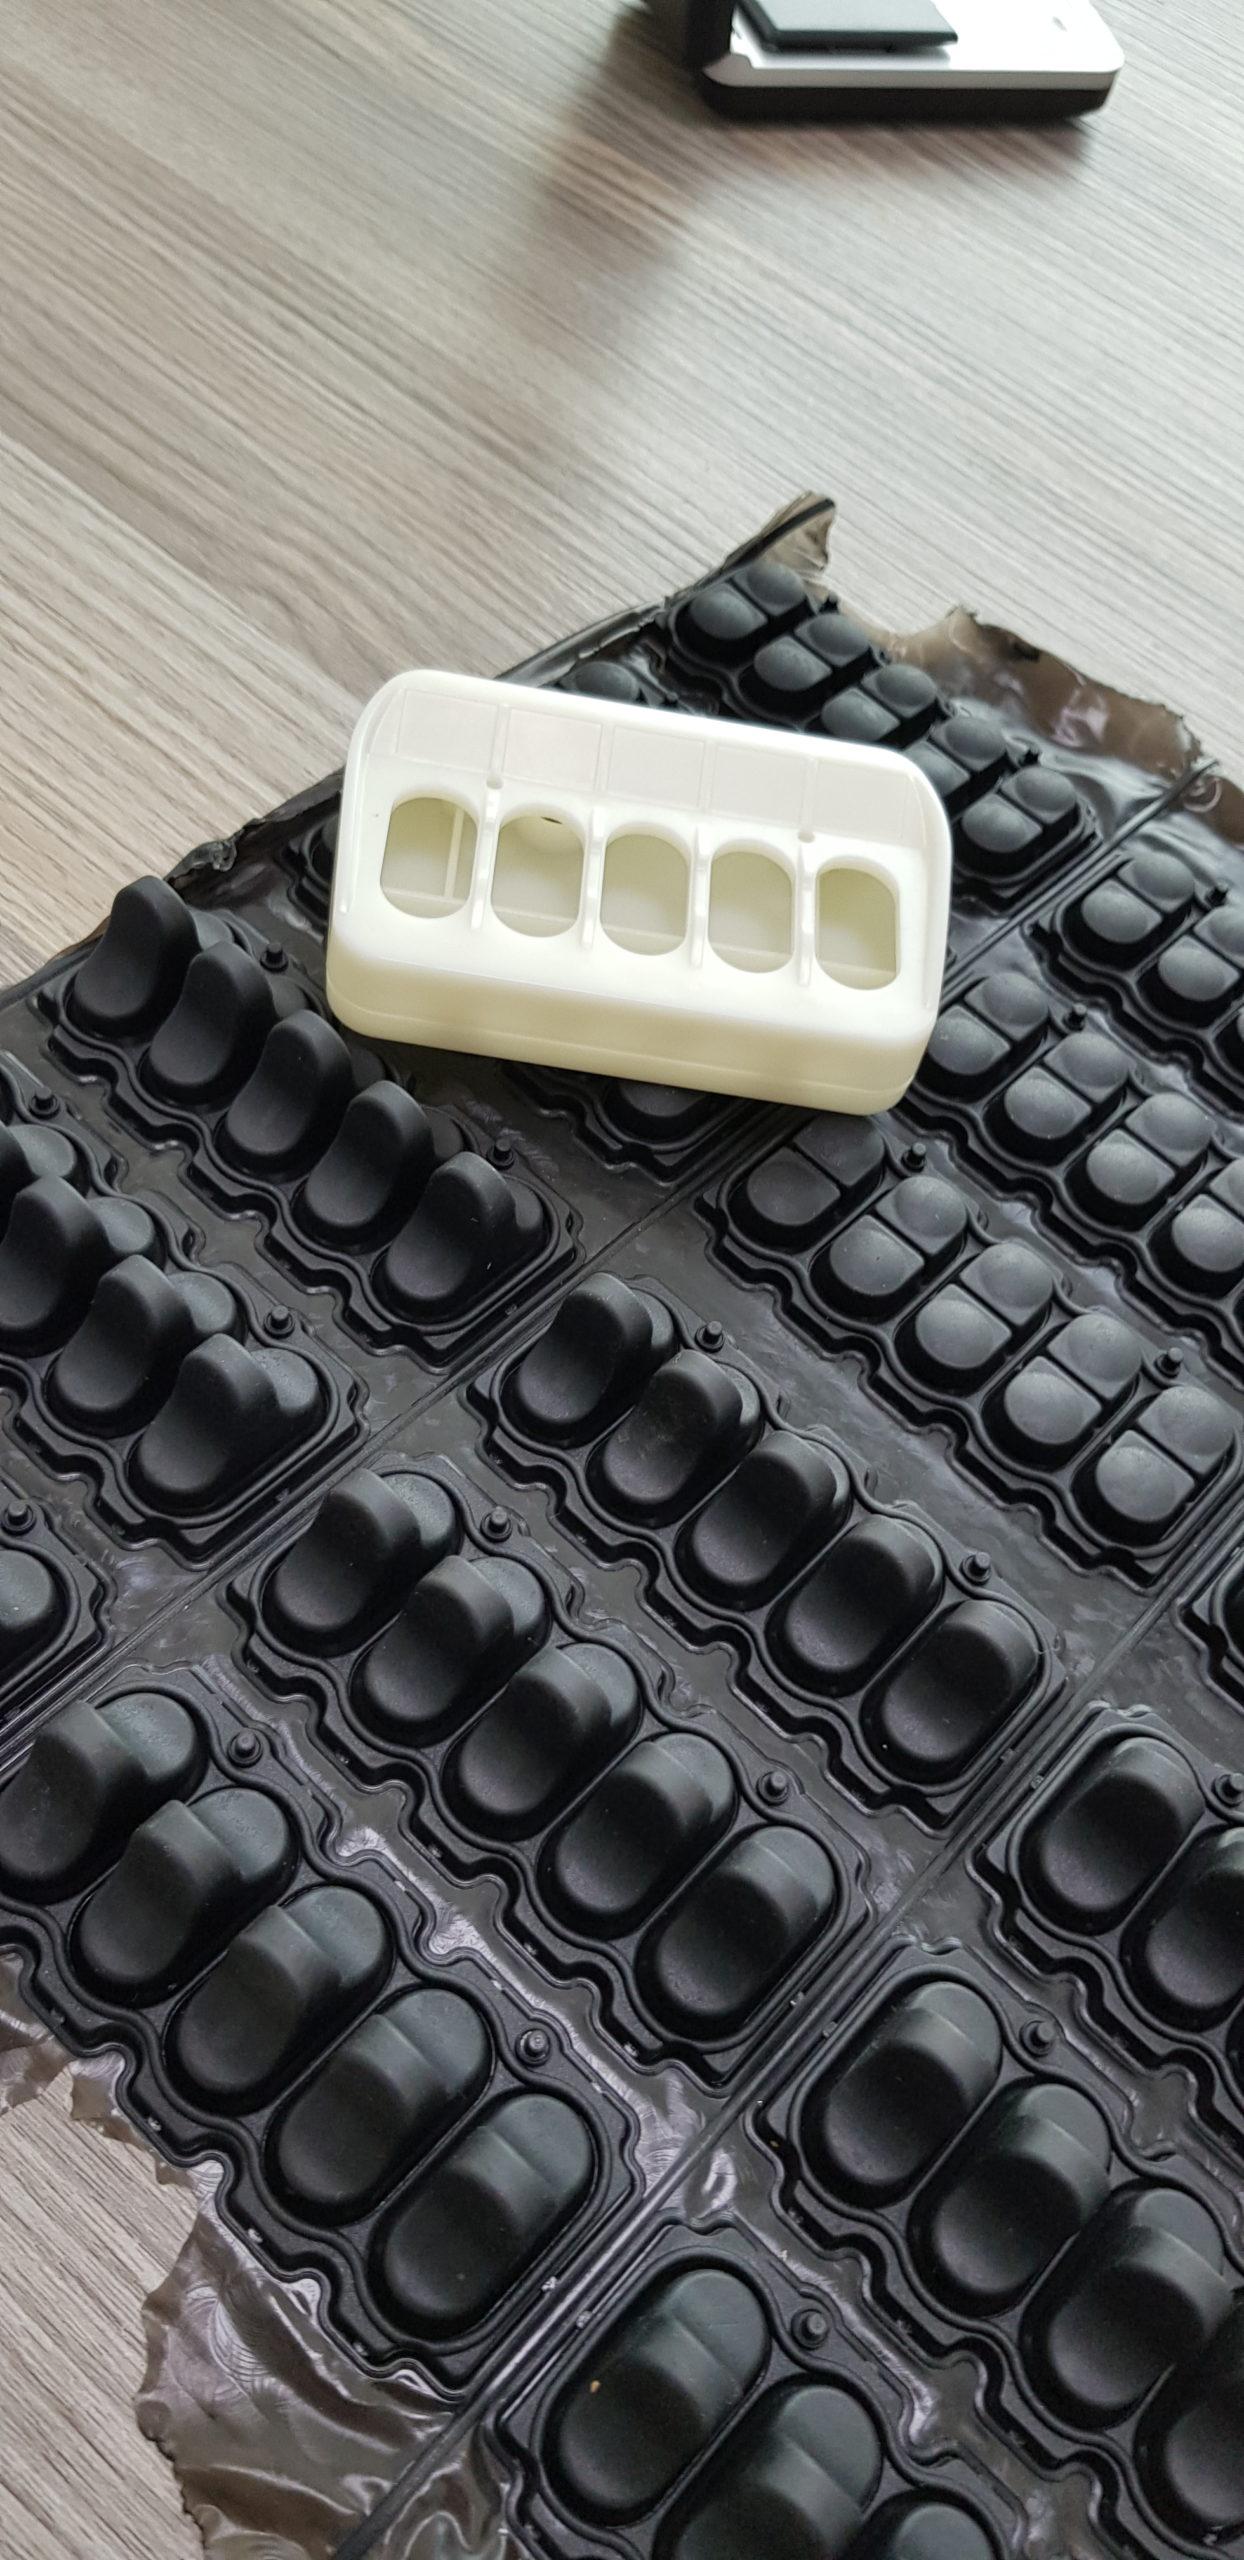 Productie van rubber toetsenbordjes